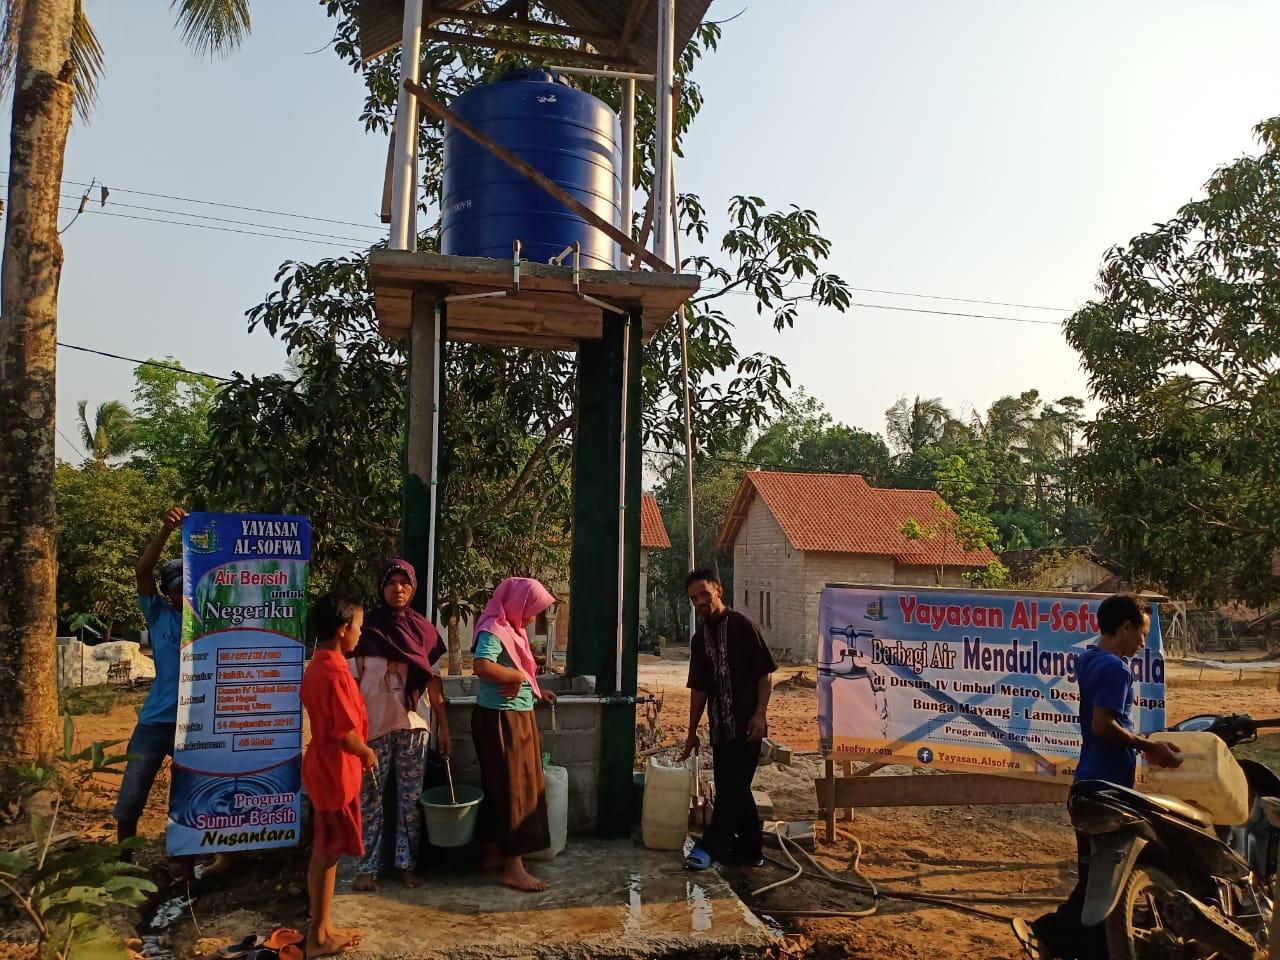 Laporan Penyaluran Program Berbagi Air Mendulang Pahala